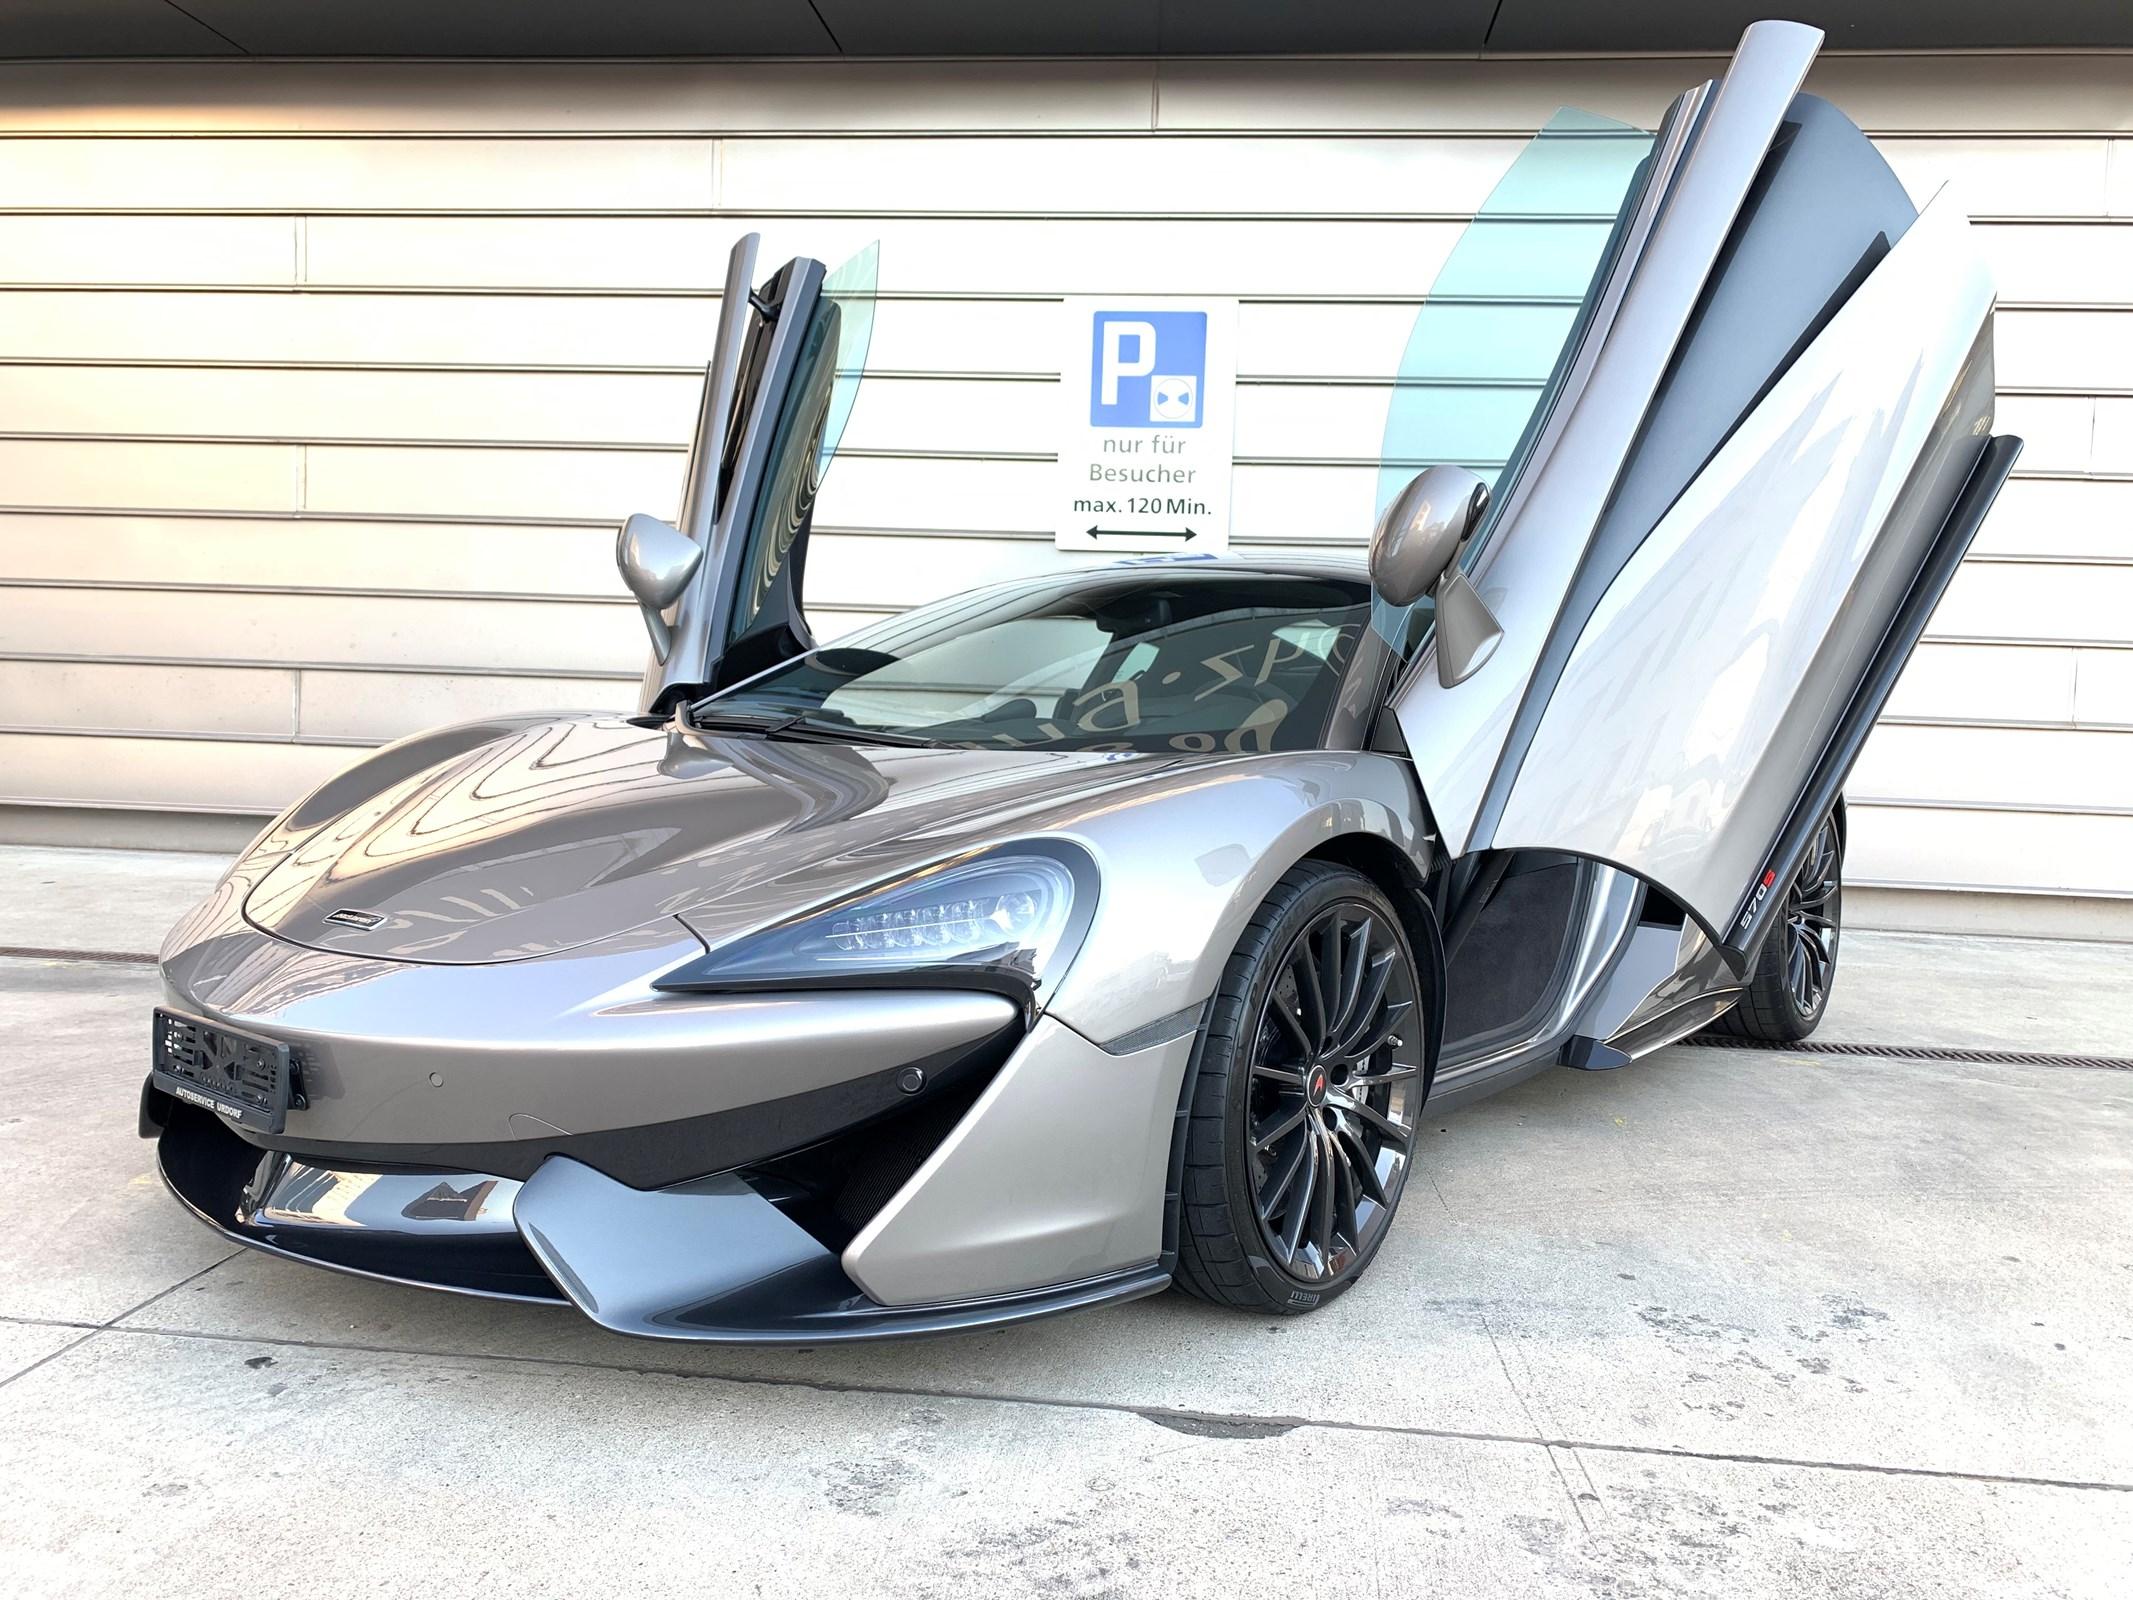 2020 McLaren 570S Coupe Images